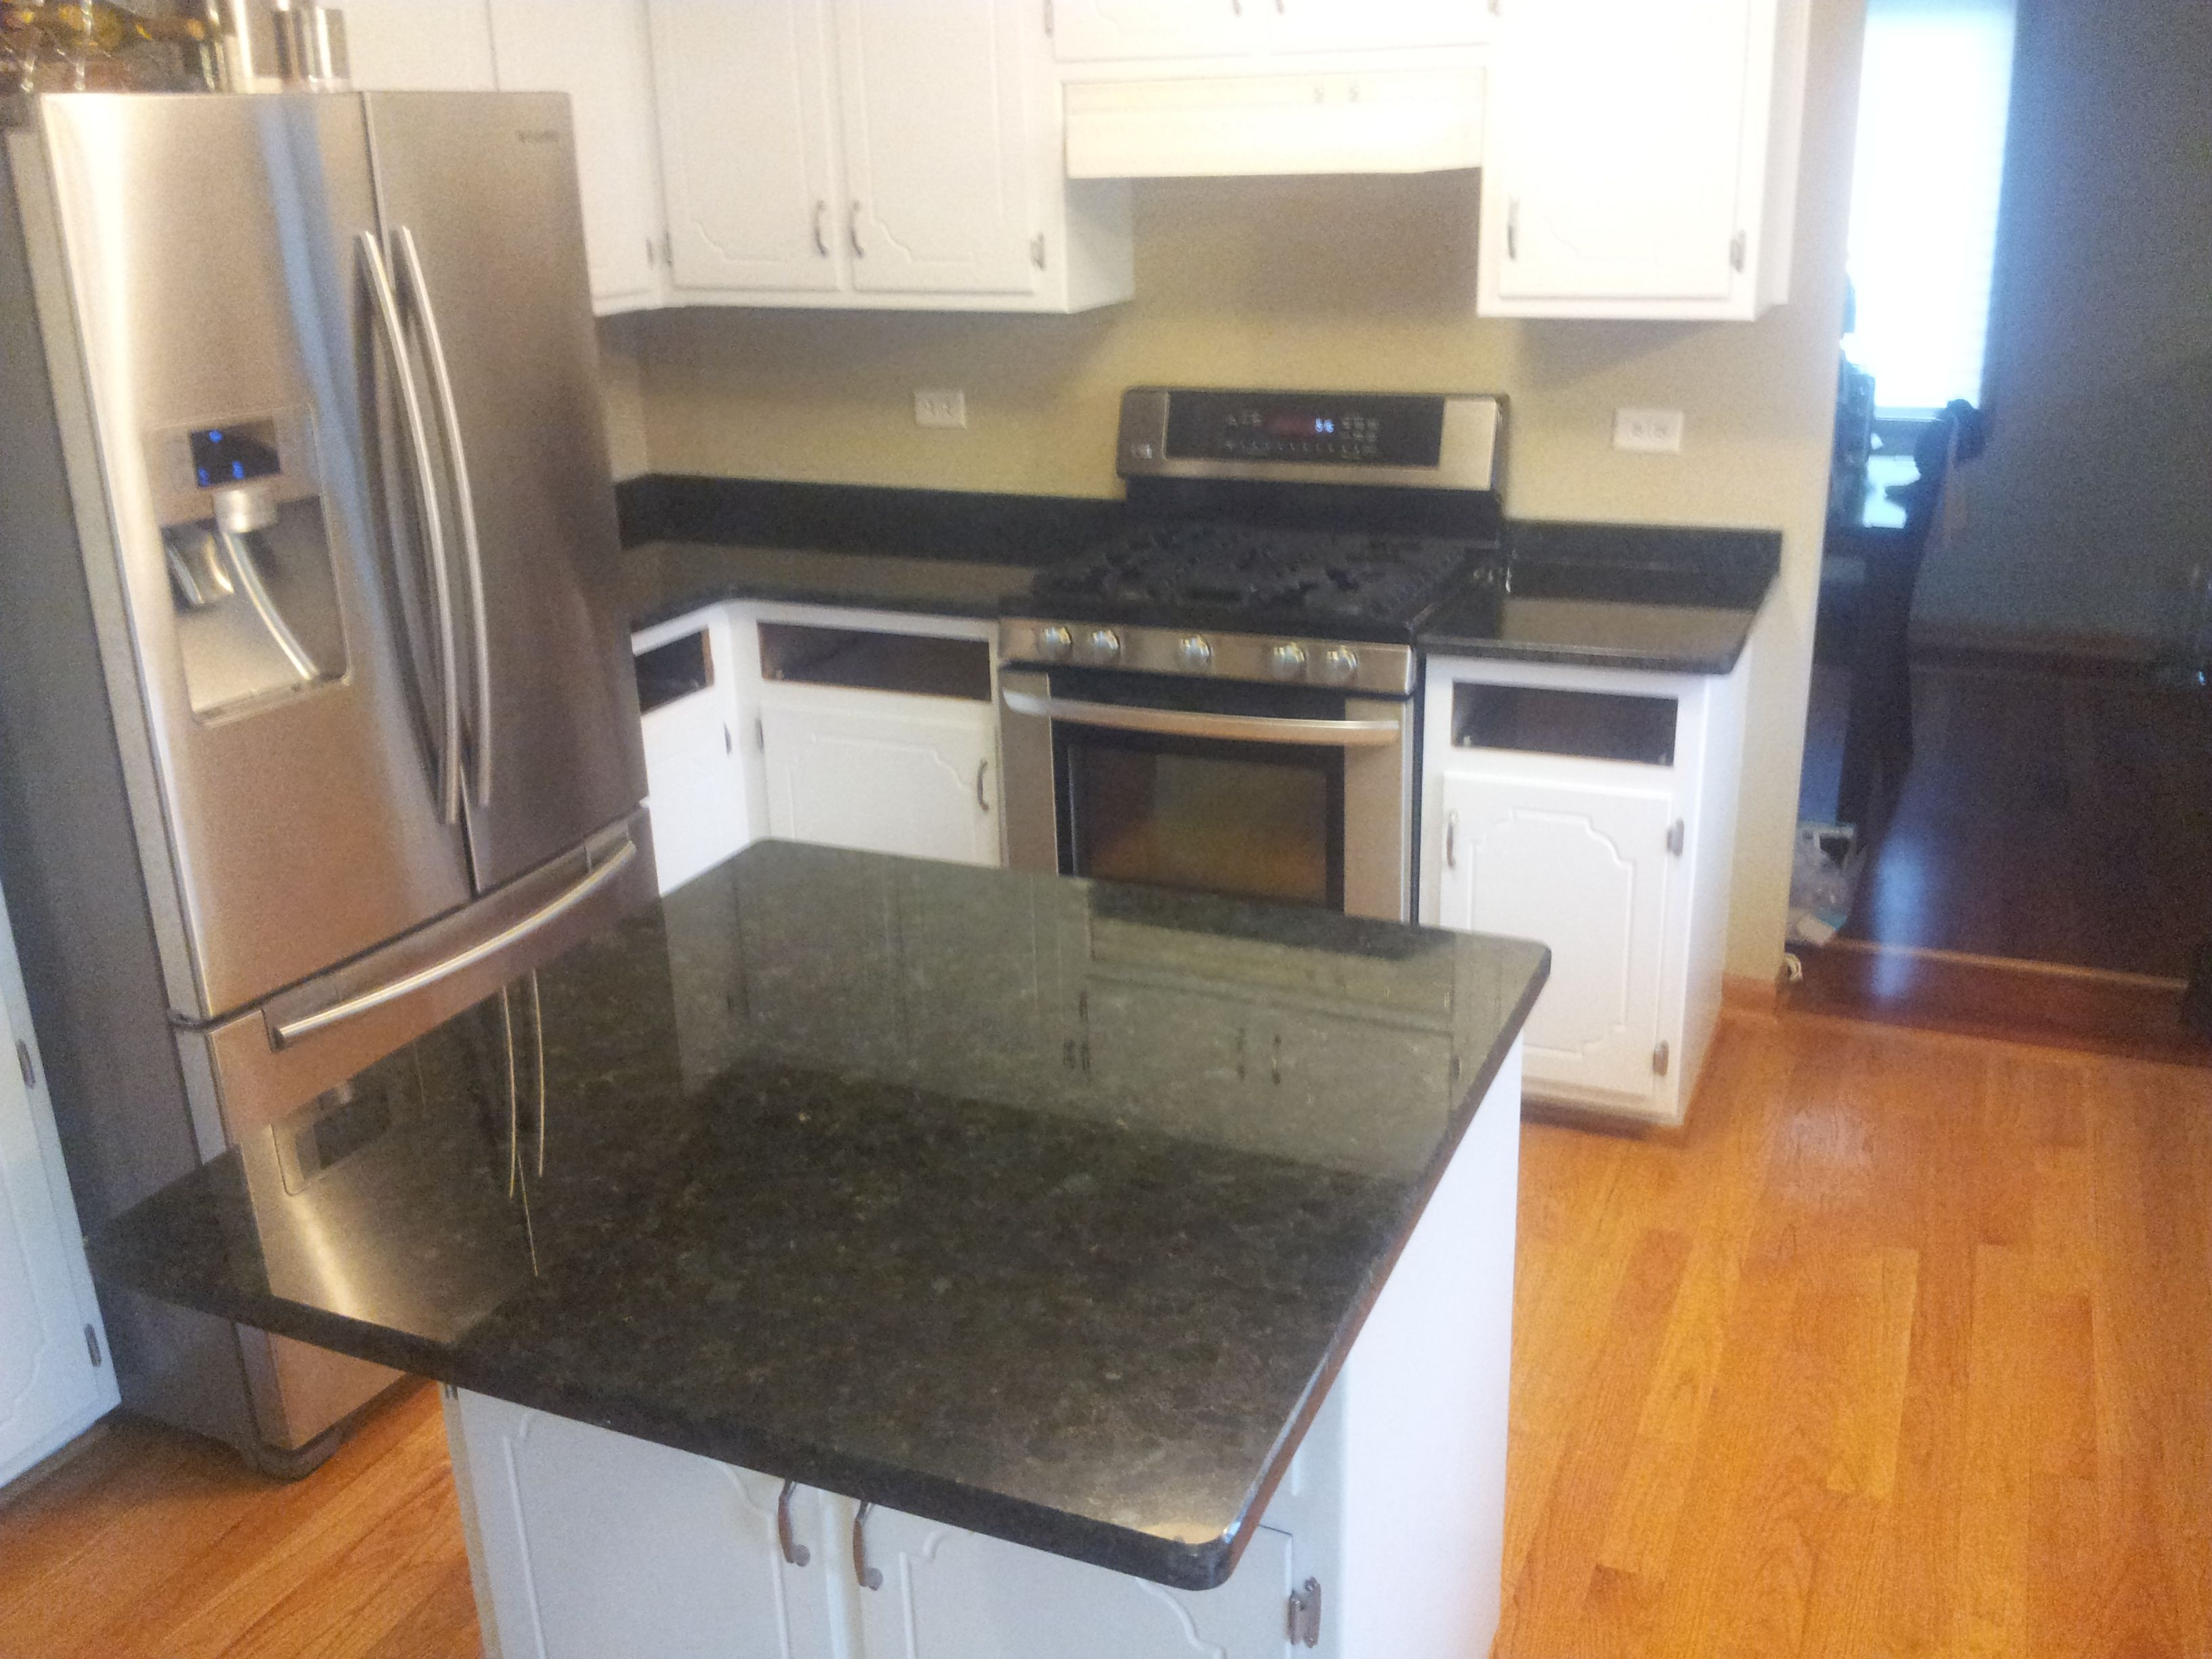 Art Granite Countertops Inc. 1020 Lunt Ave . Unit F Schaumburg IL , 60193  Tel:(847) 923 1323 Fax:847 810 0399 E MAIL : Graniteartinc@gmail.cu2026 |  Pinteresu2026